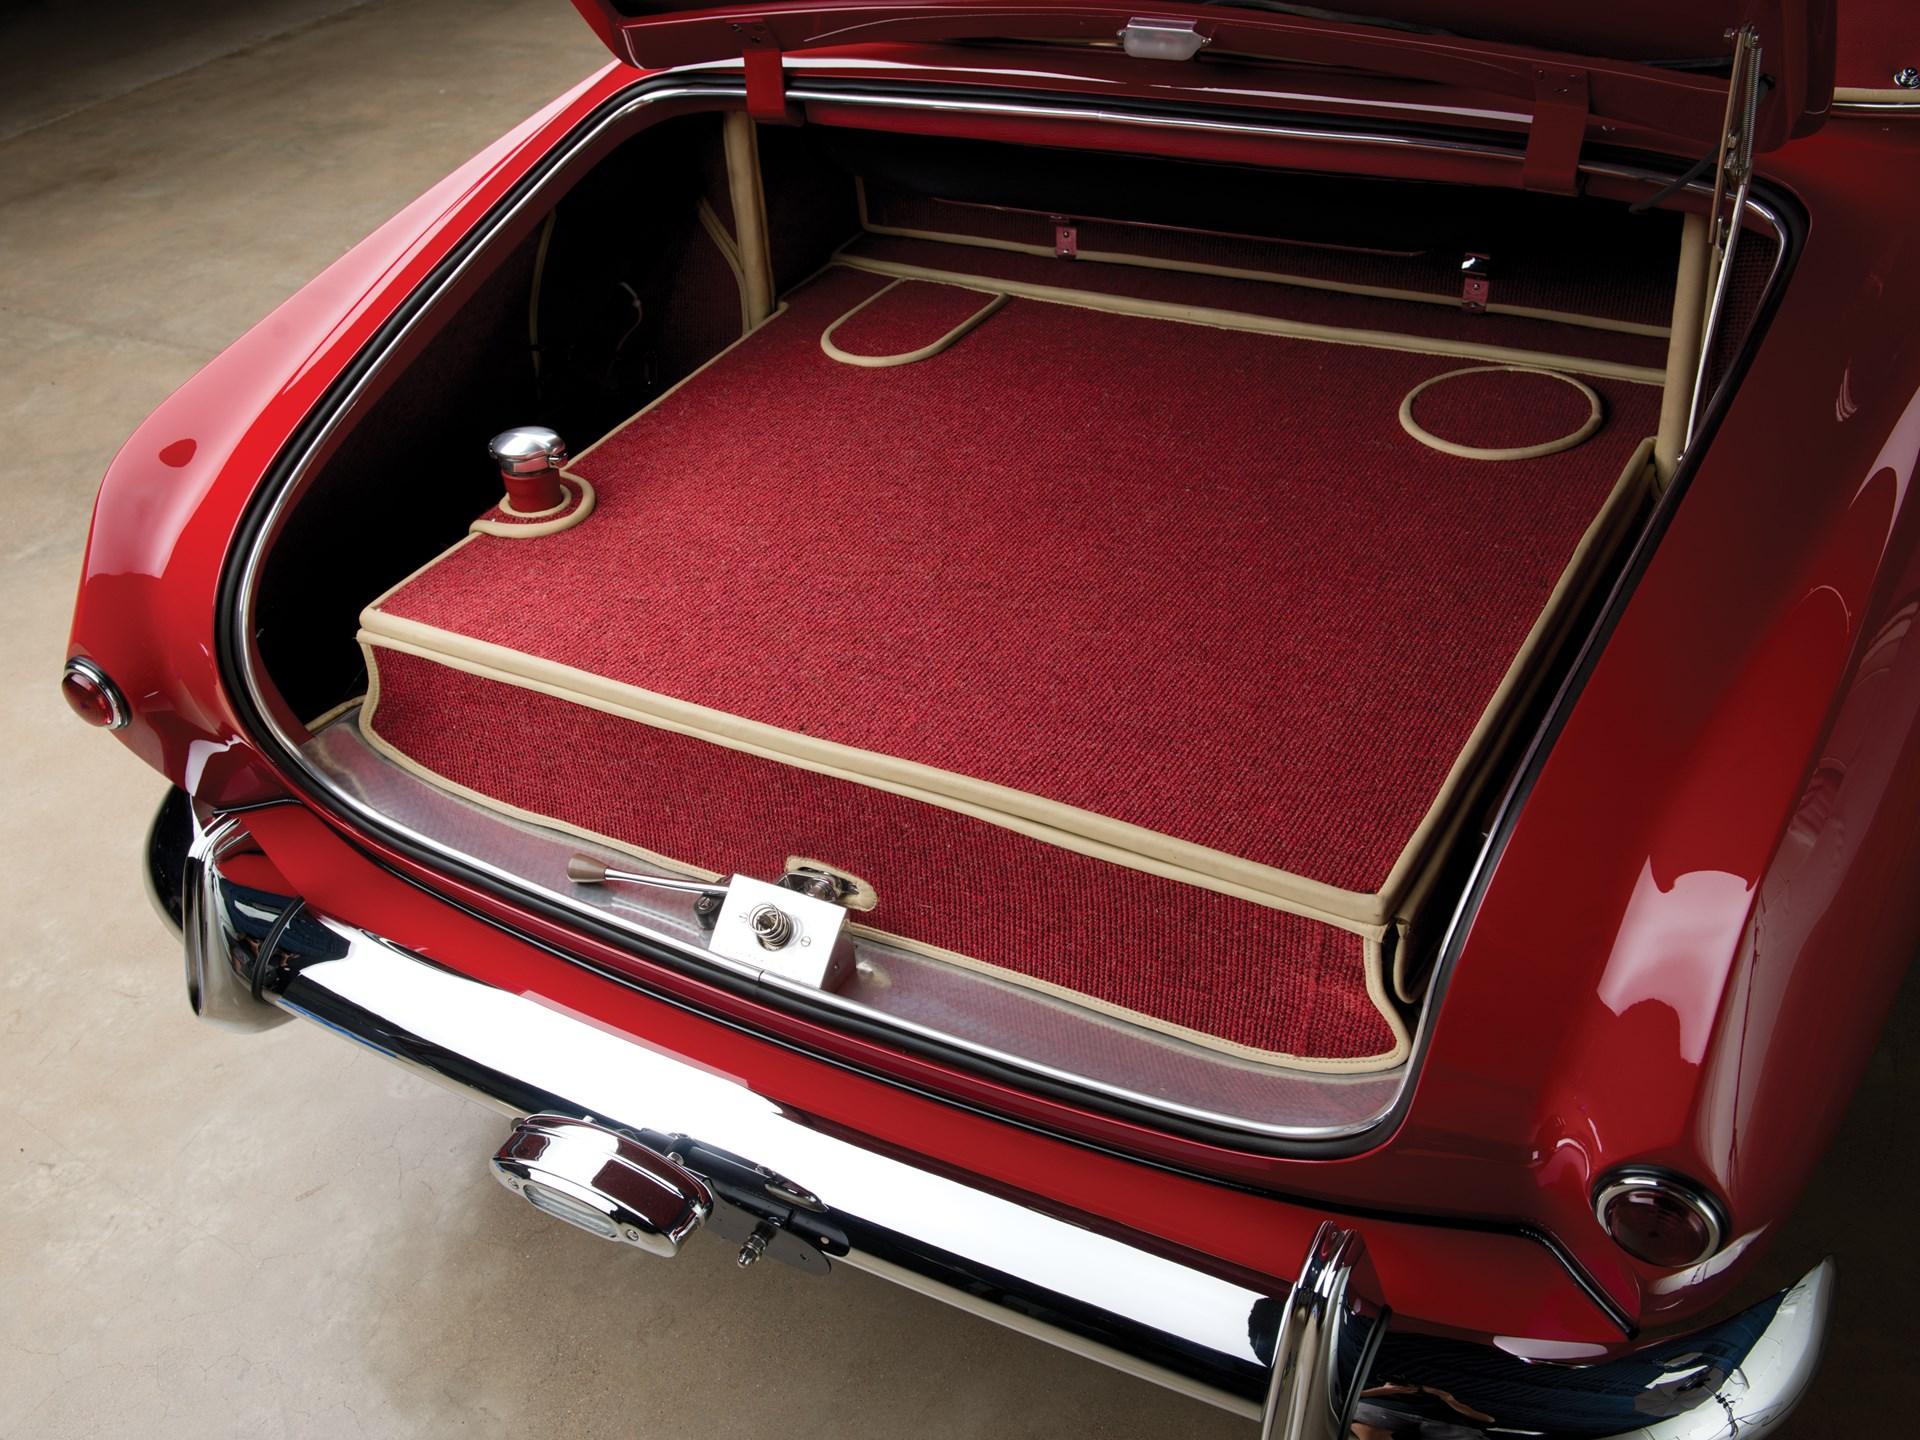 1953 Aston Martin DB2/4 Drophead Coupe by Bertone